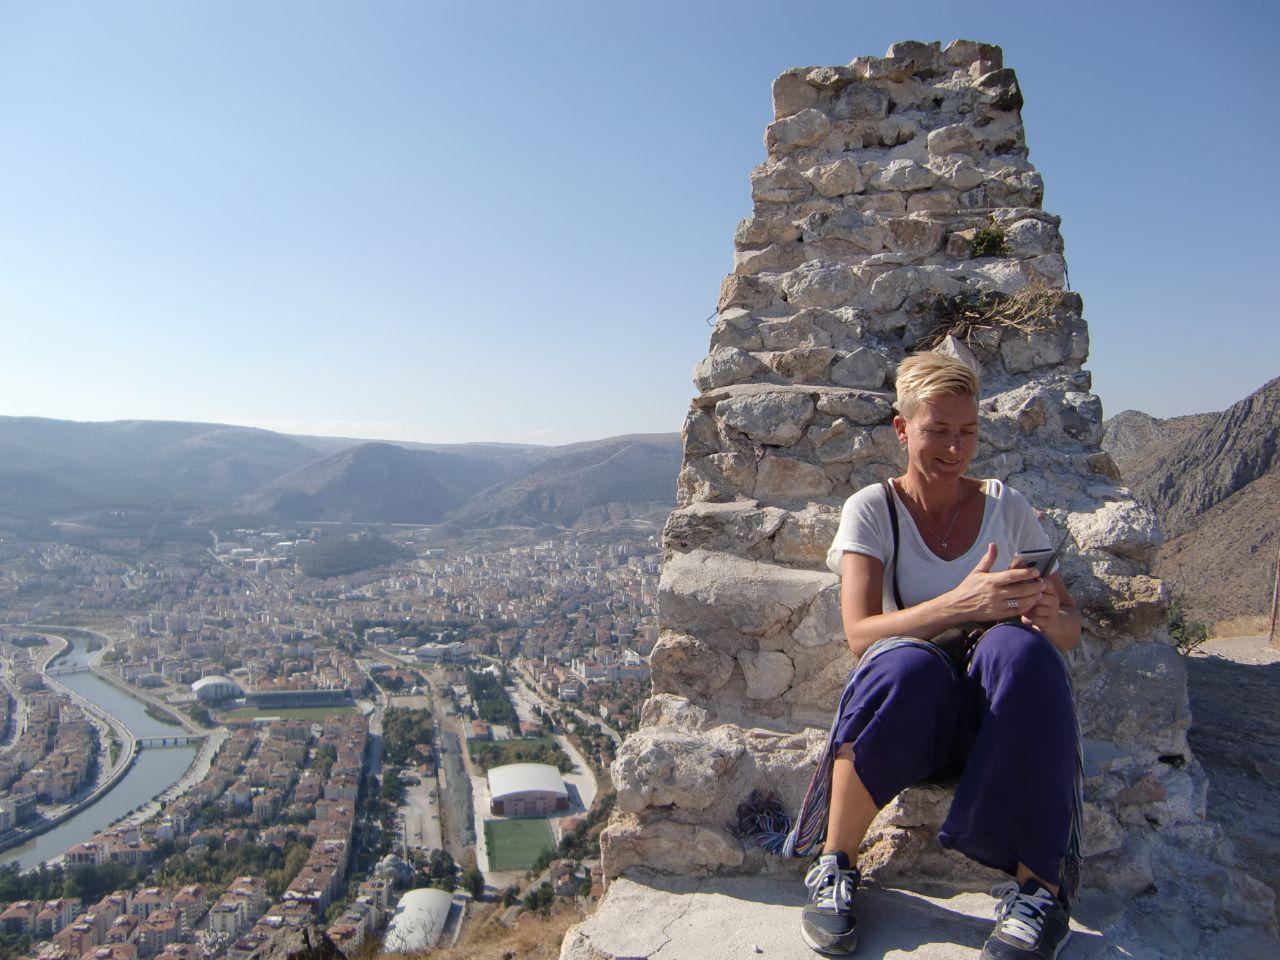 Rondreis Midden Turkije Turkeytraveller Margreet op burcht Kastamonu